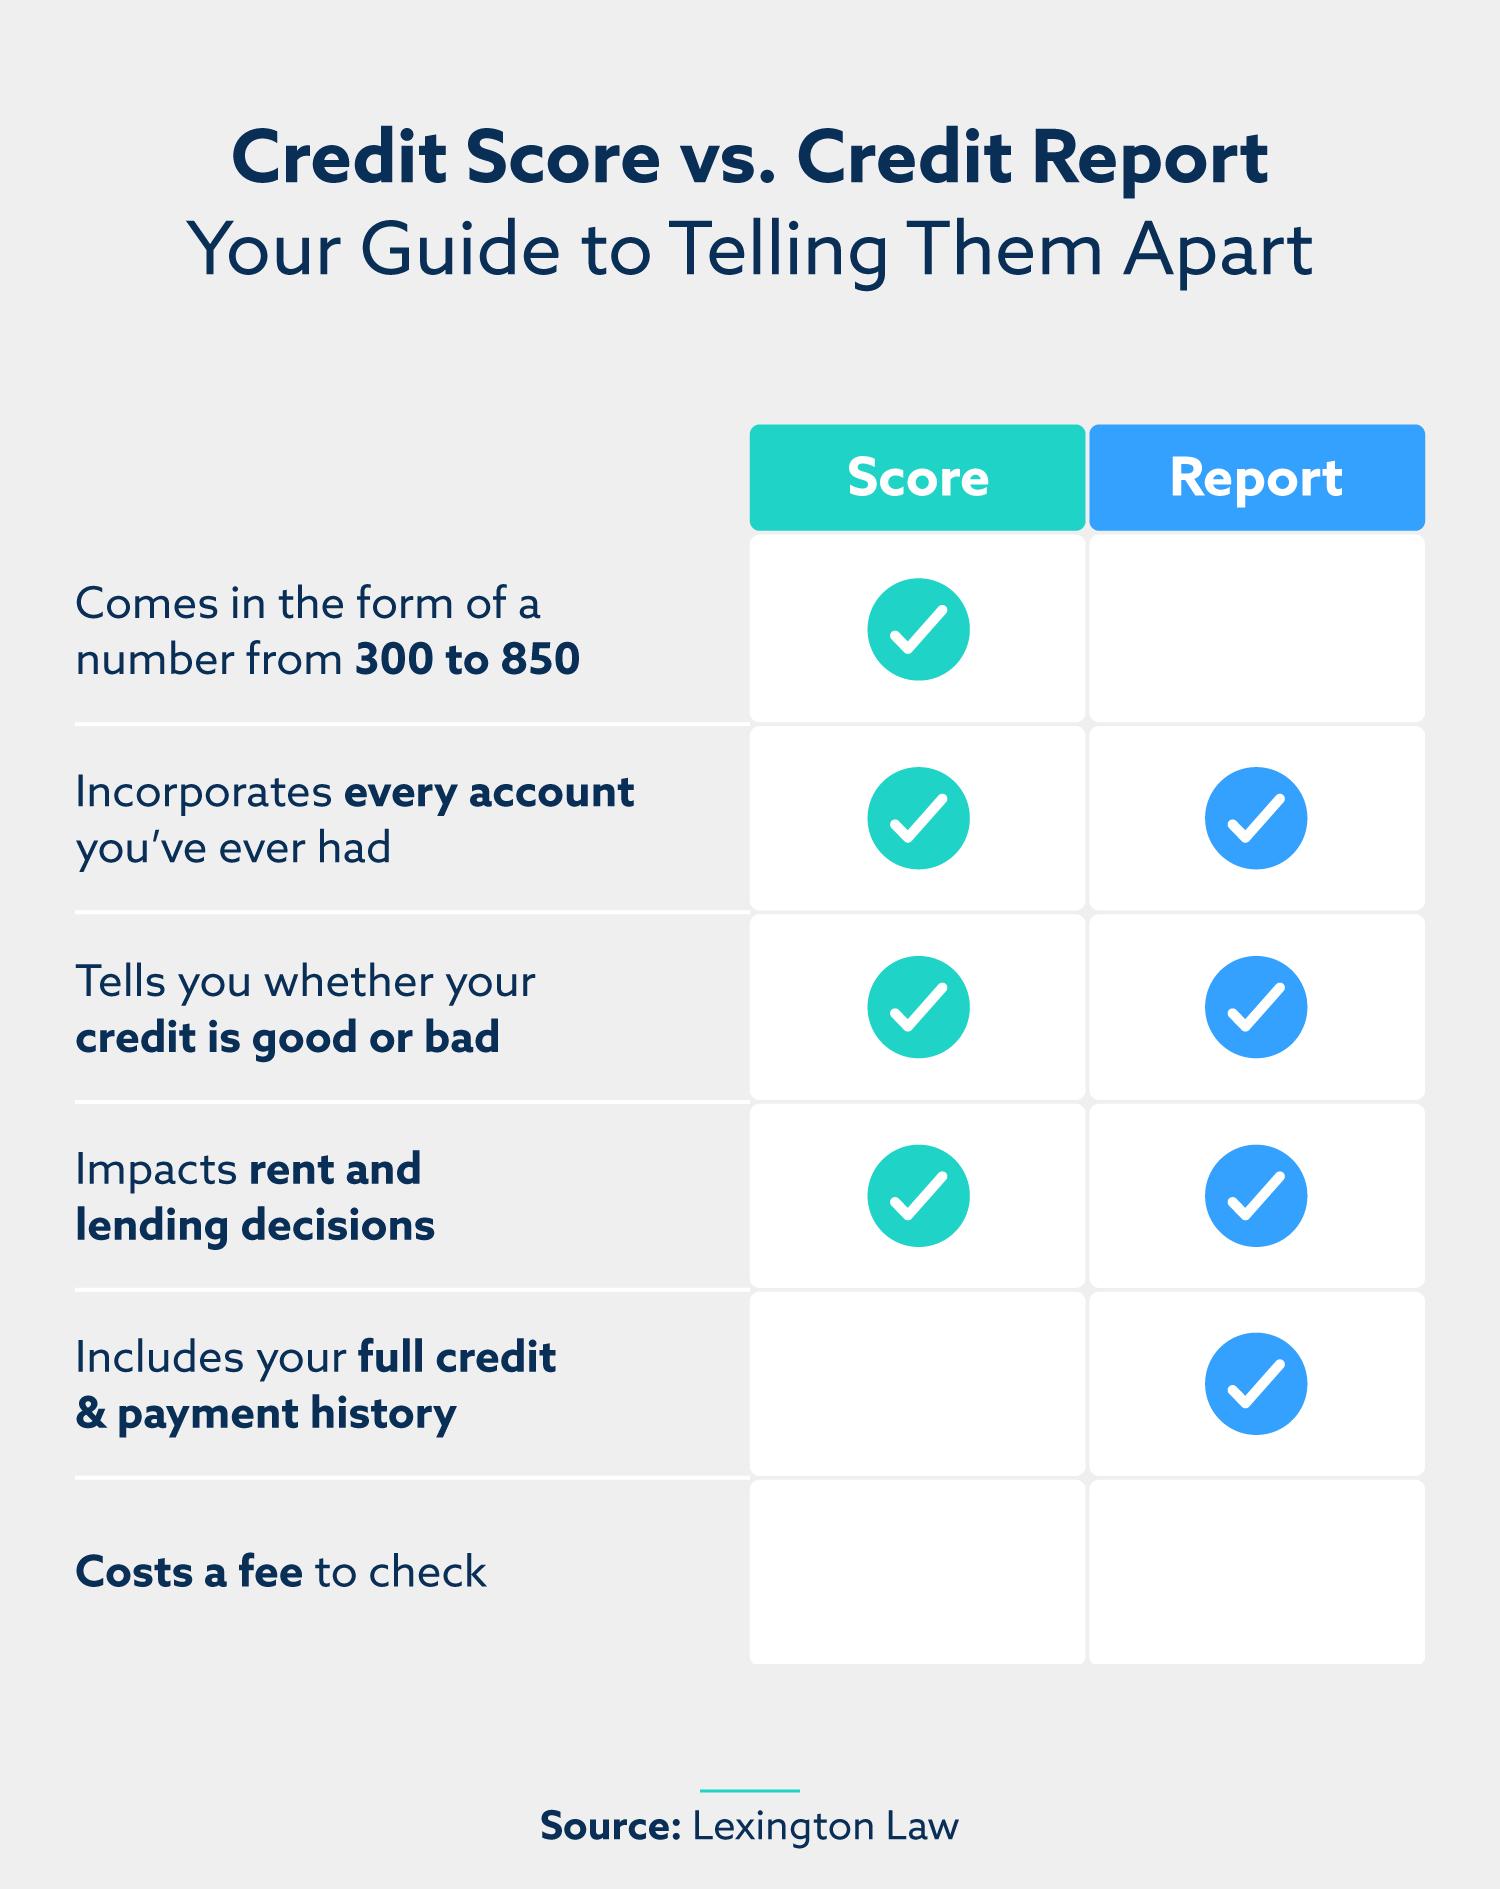 chart comparing credit scores vs credit reports